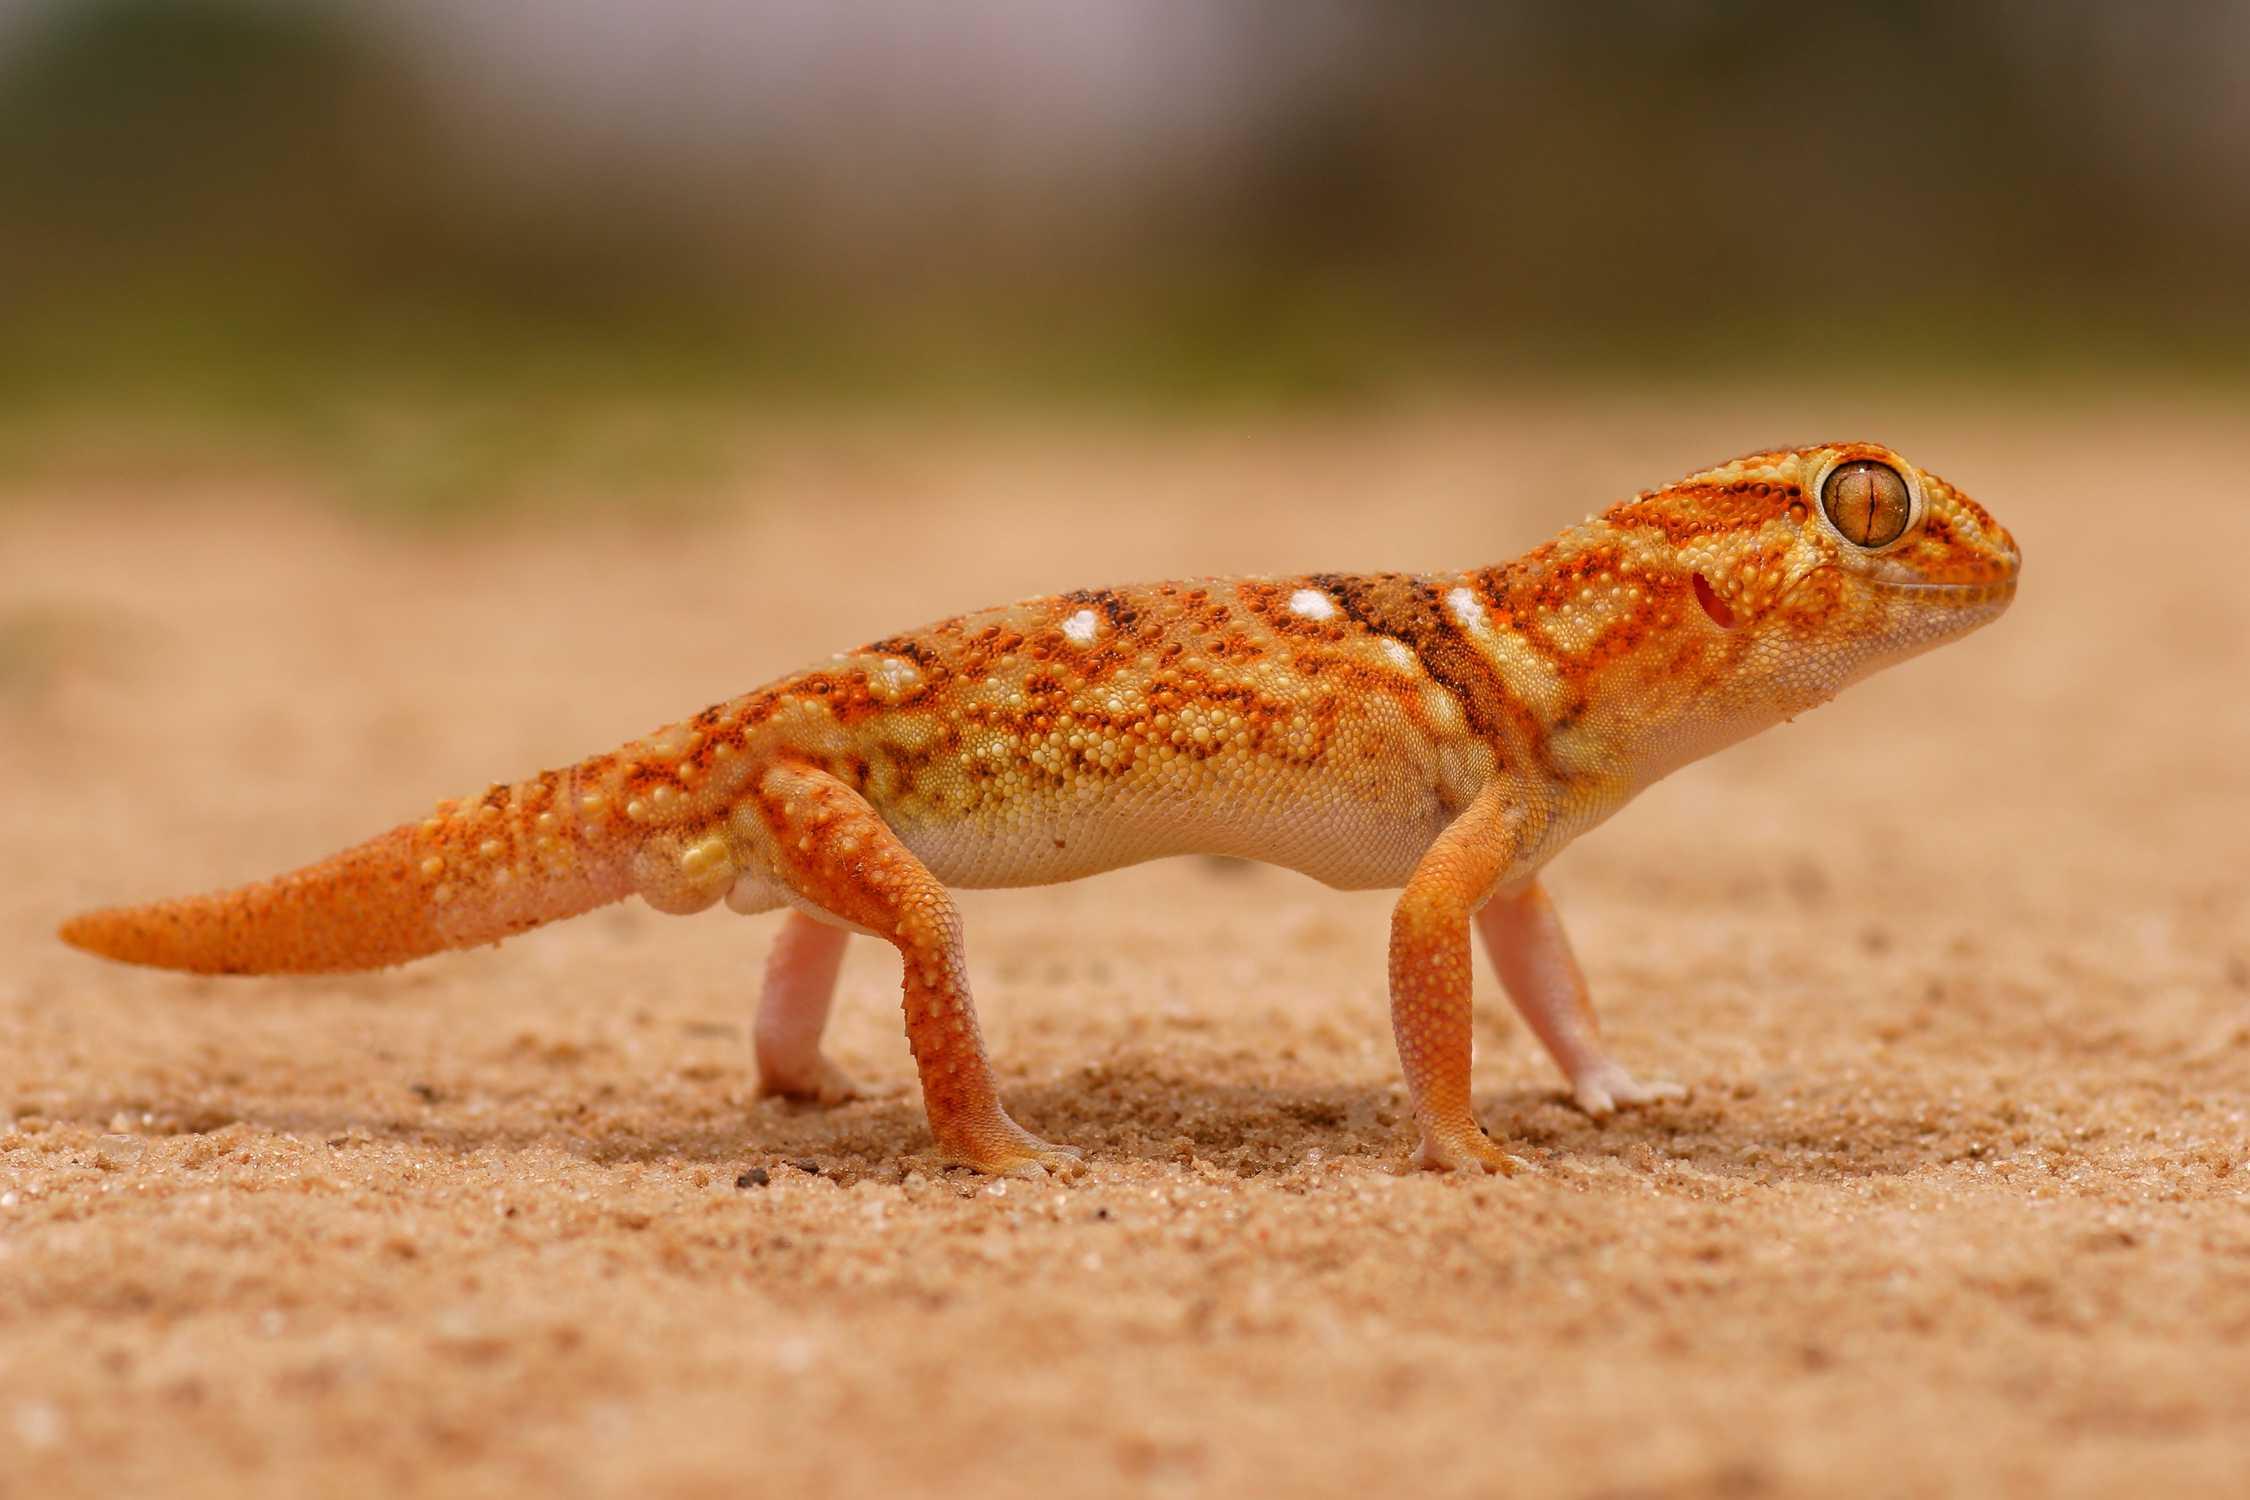 Giant ground gecko - Chondrodactylus angulifer